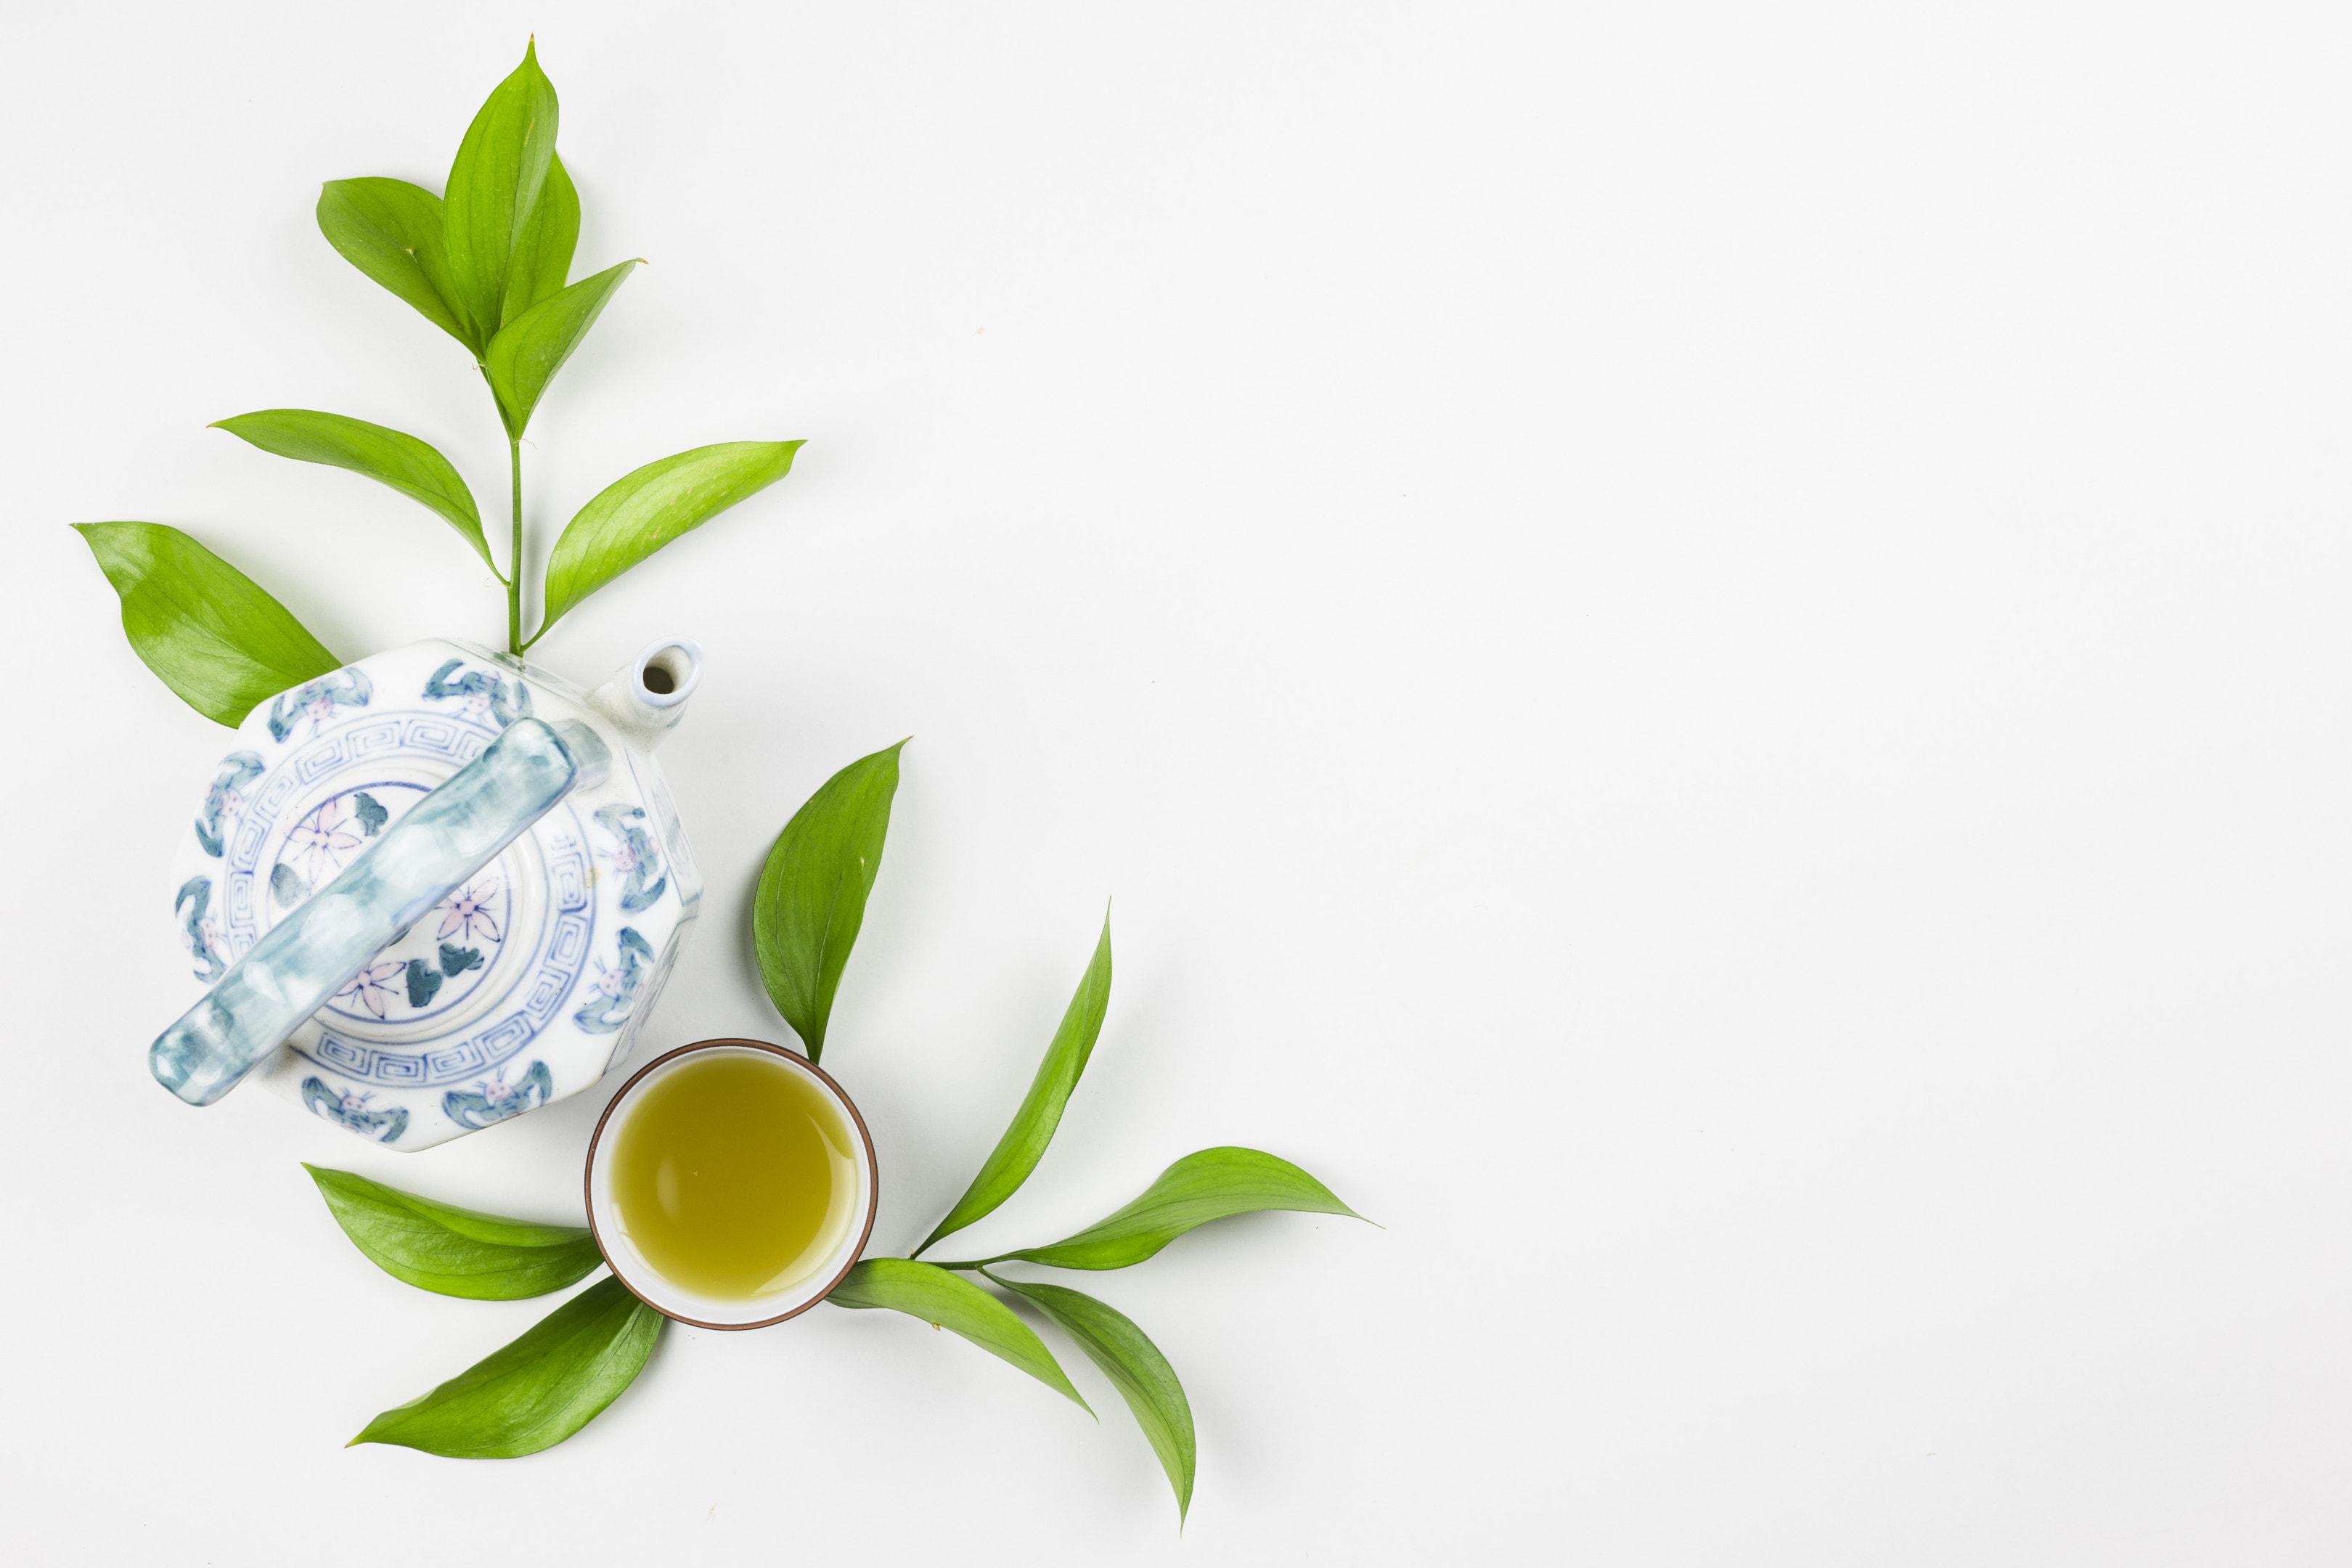 Matcha Green Tea Preparation